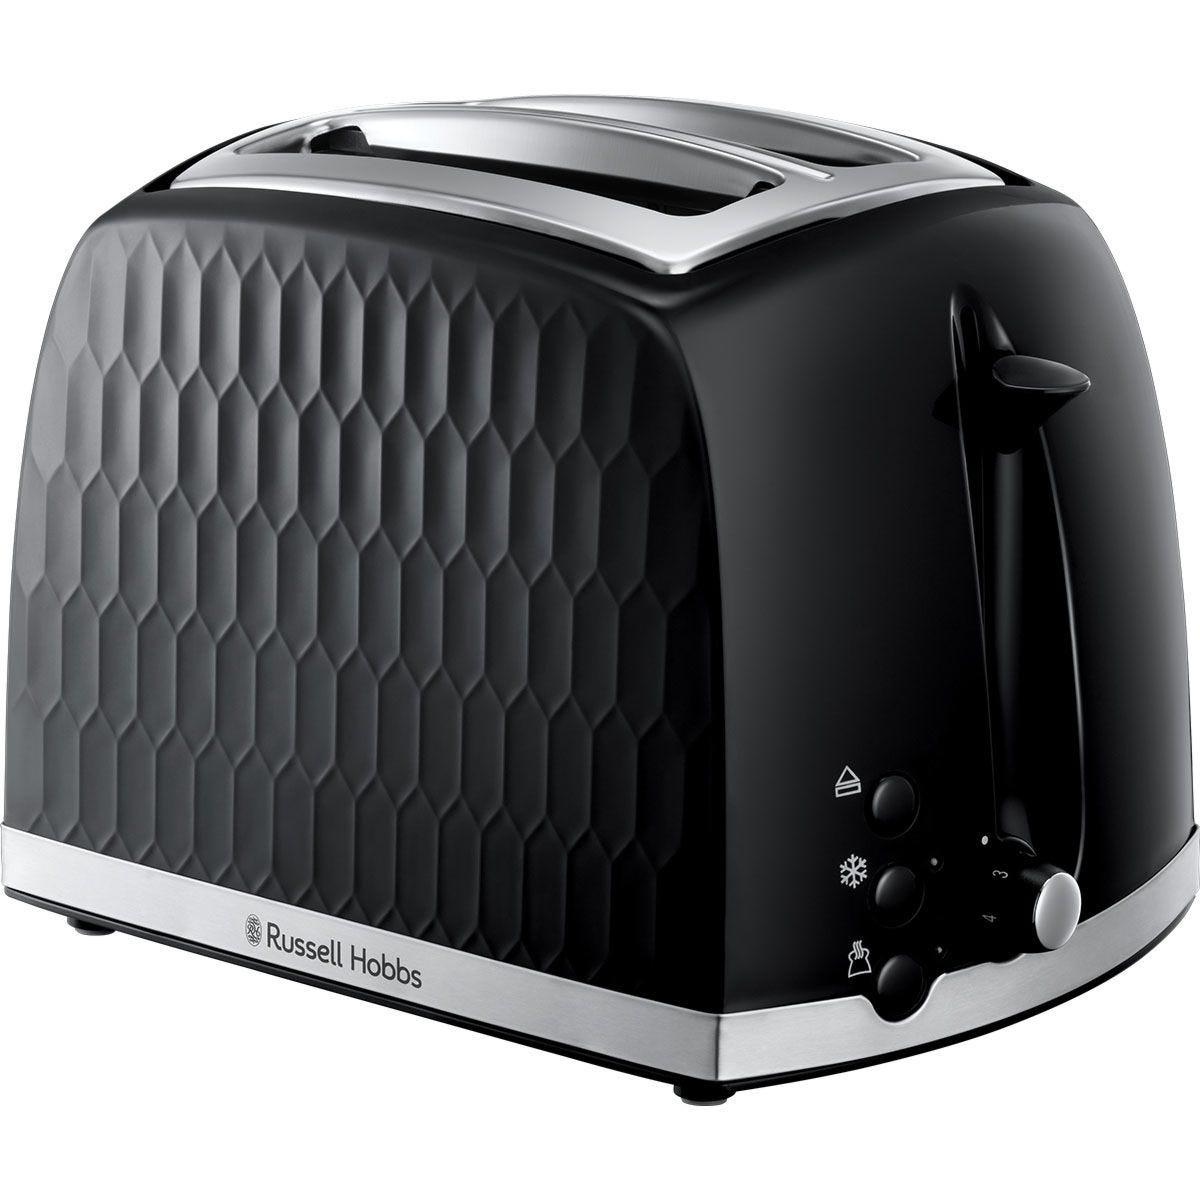 Russell Hobbs 26061 Honeycomb Textured 850W 2-Slice Toaster - Black